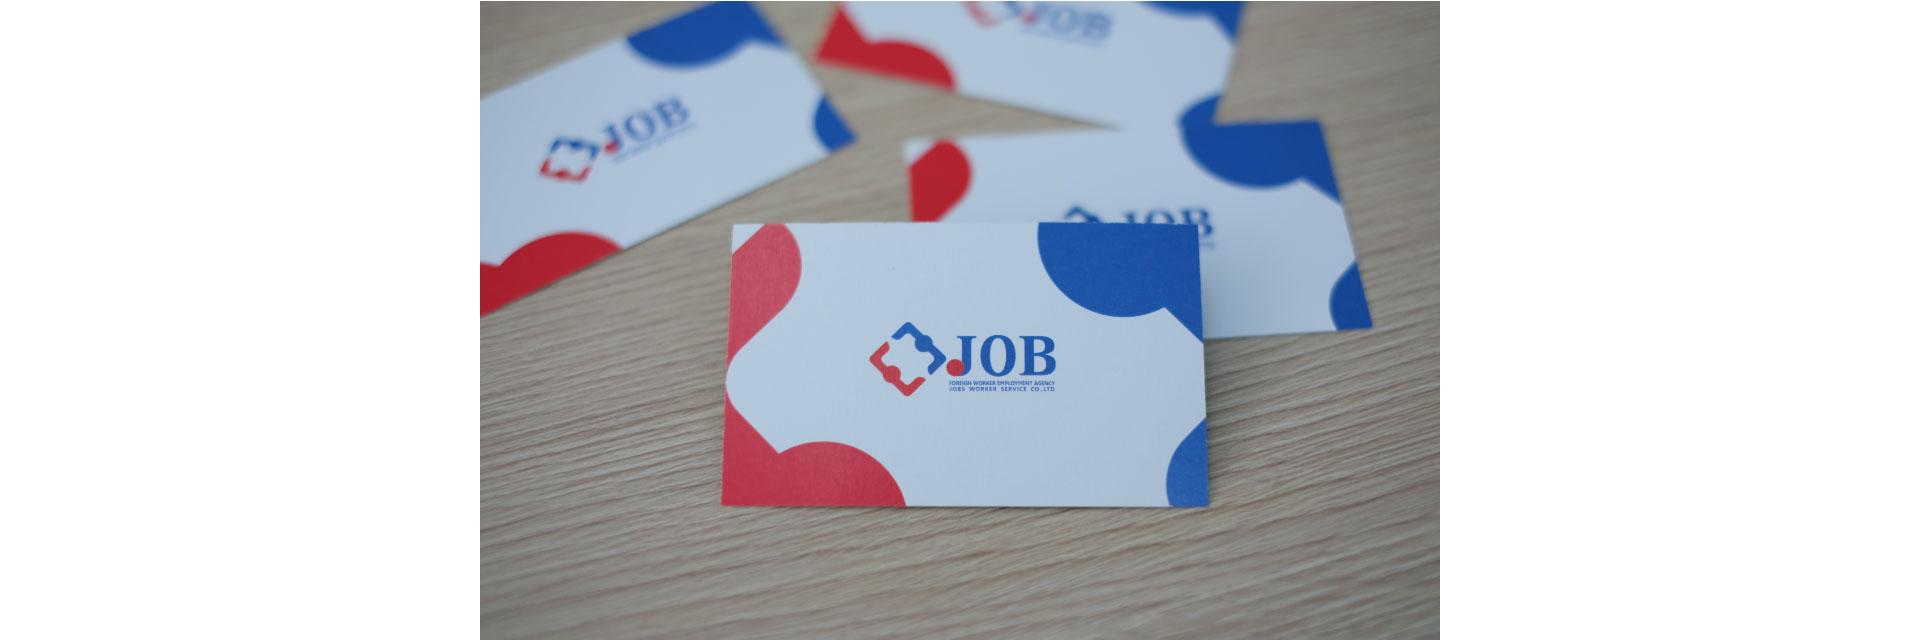 Banner - JOB service